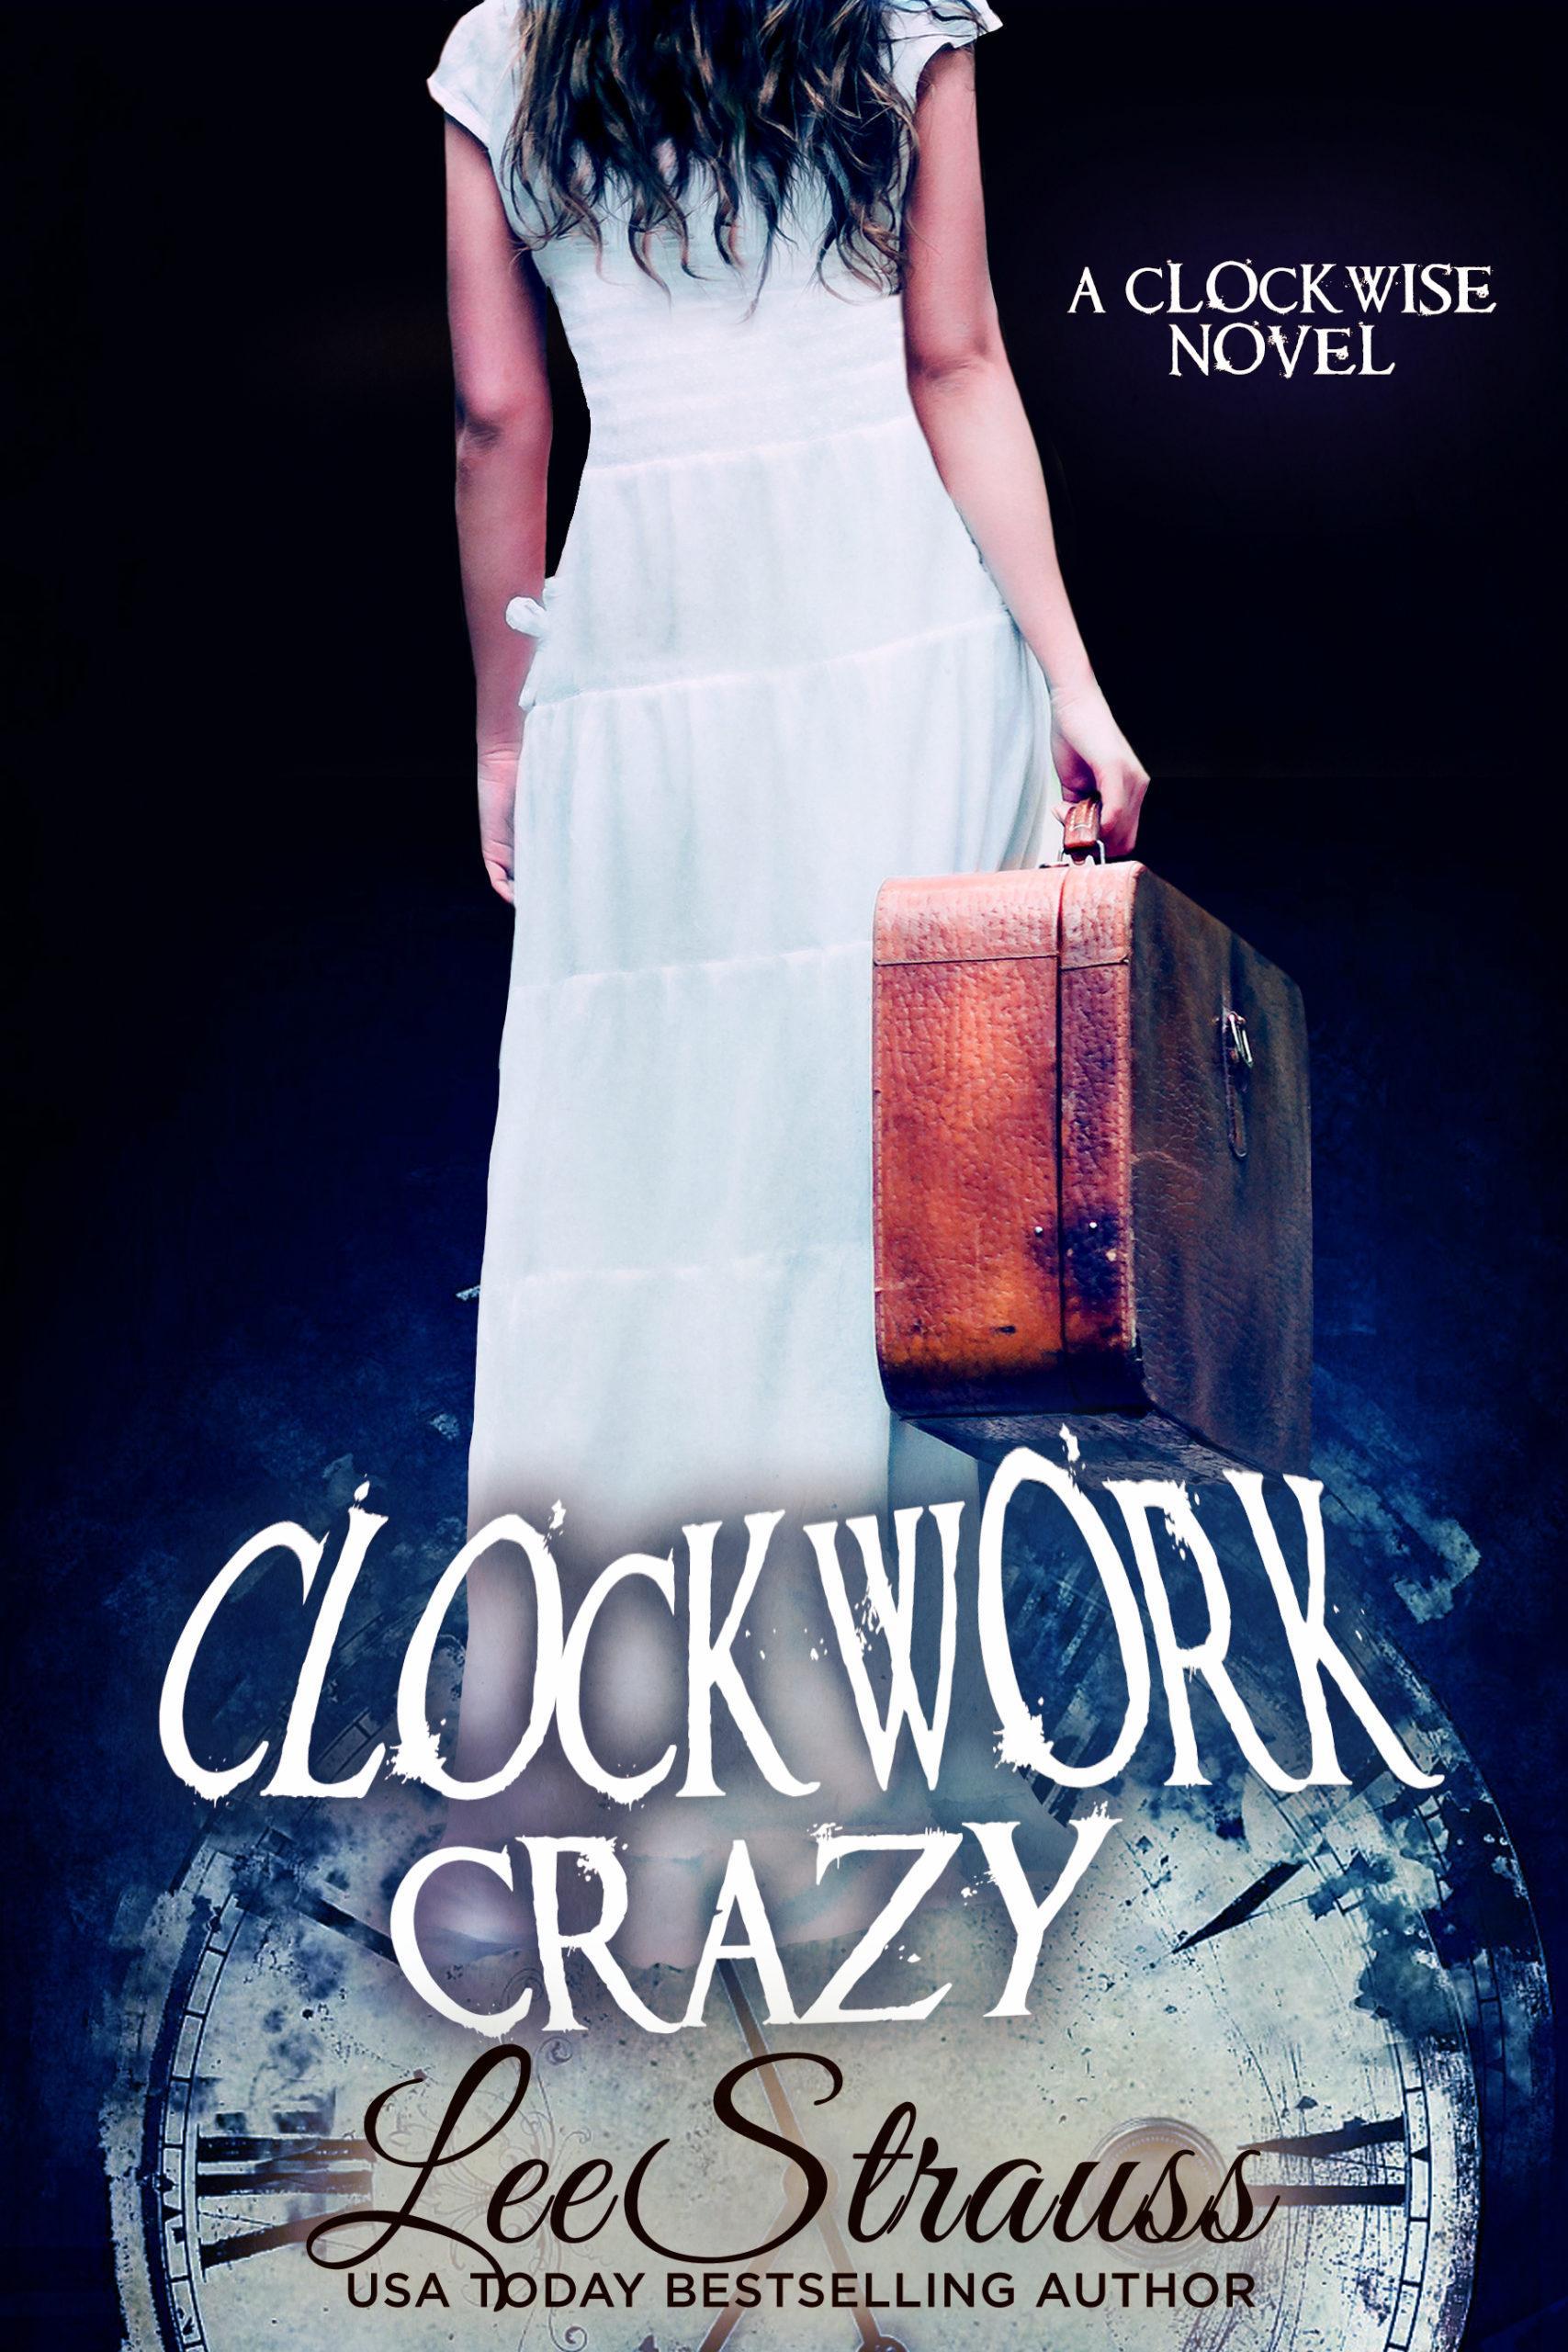 ClockworkCrazy_Lee-USA-CVR